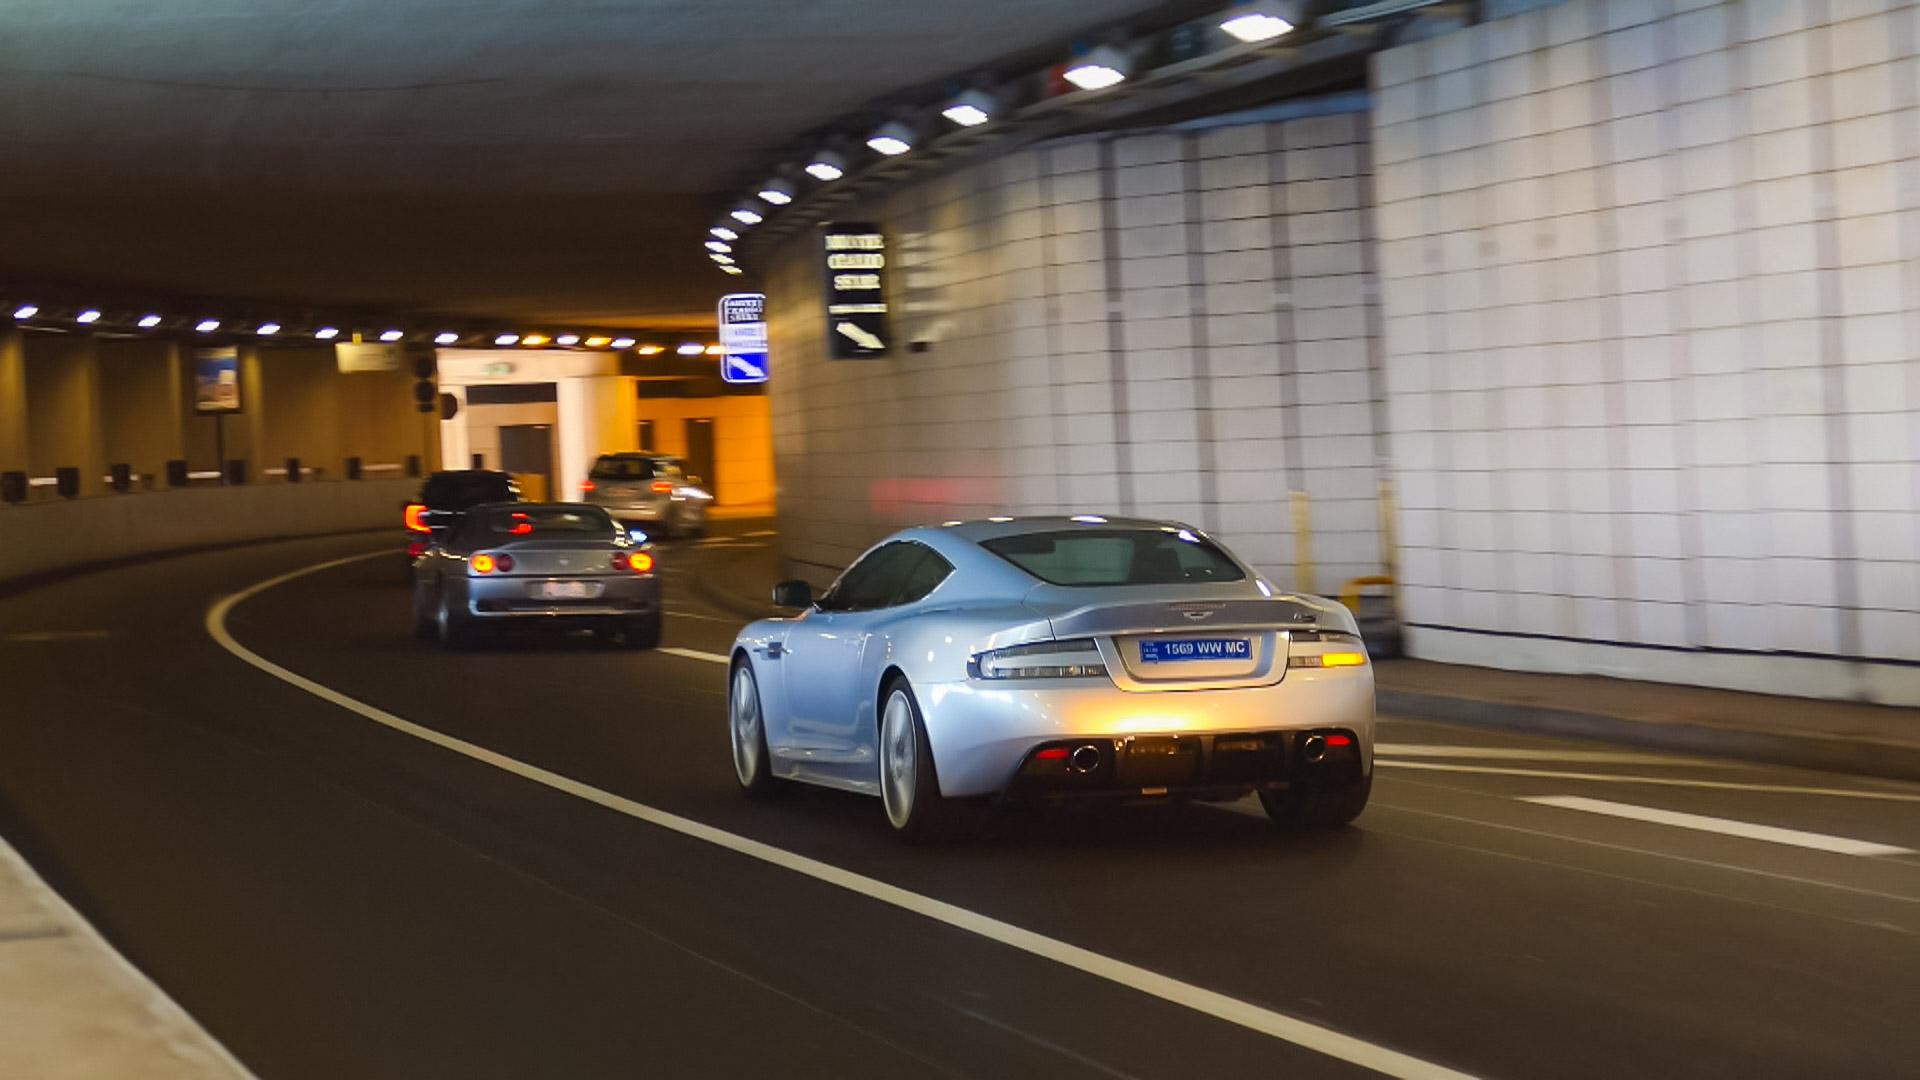 Aston Martin DBS - 1569-WW-MC (MC)